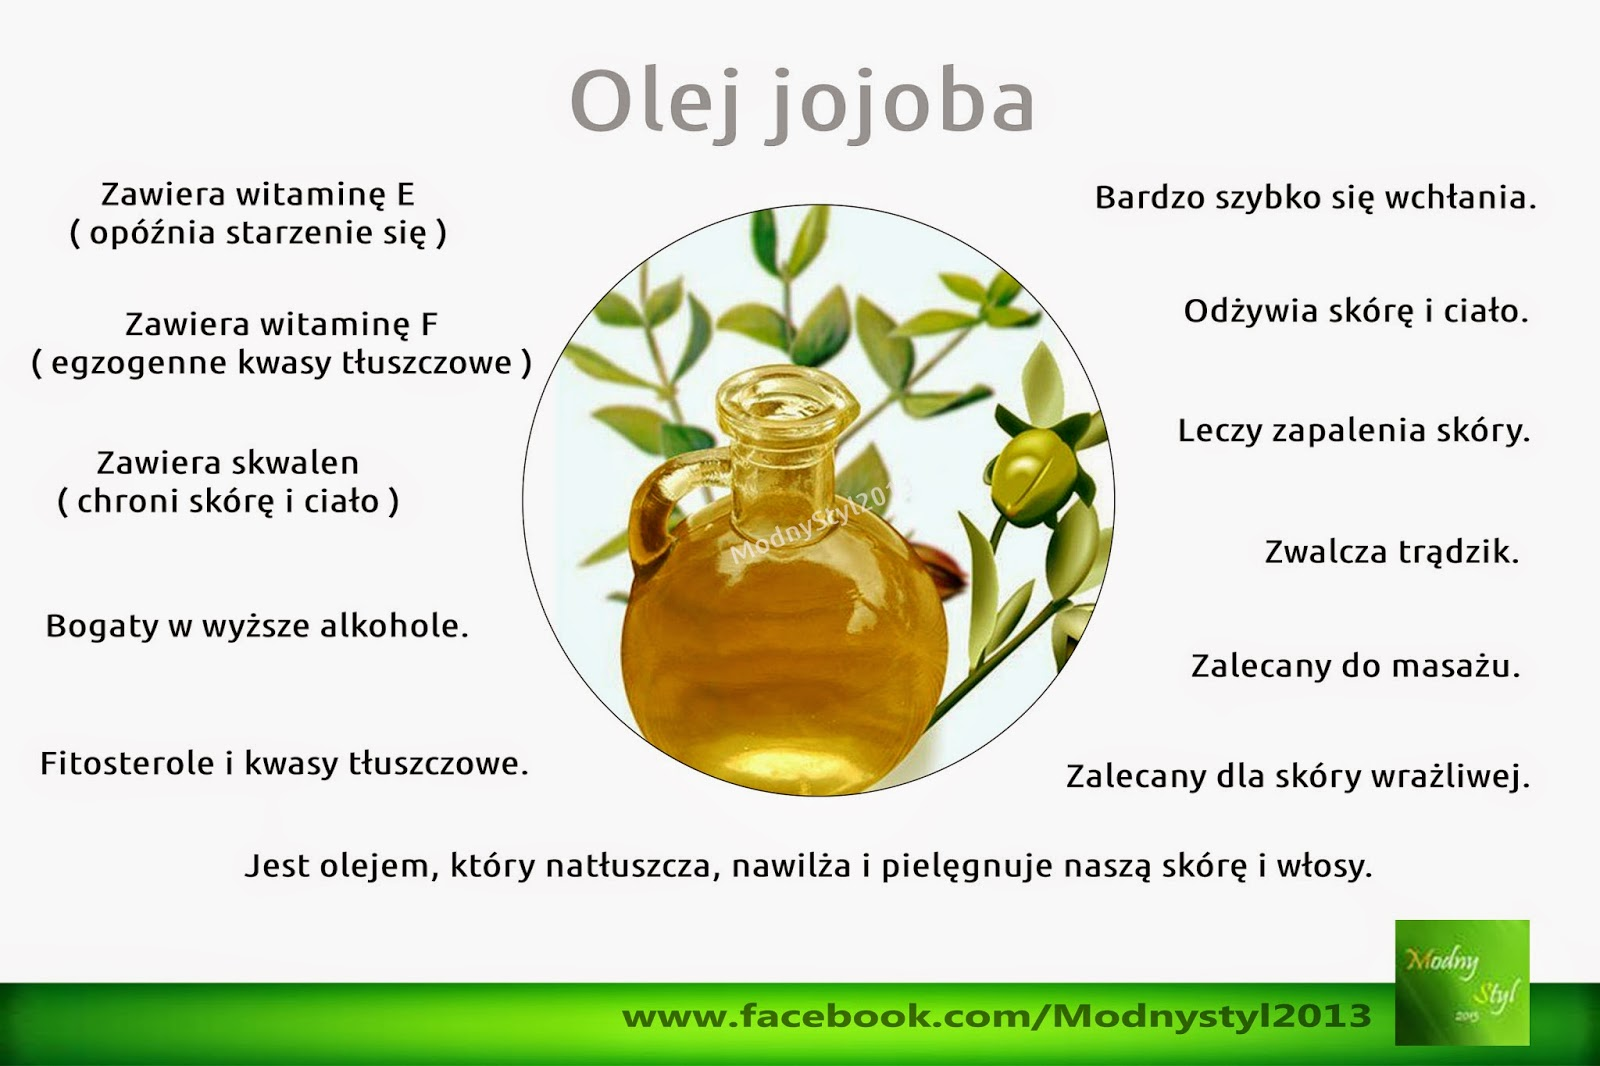 Olej jojoba